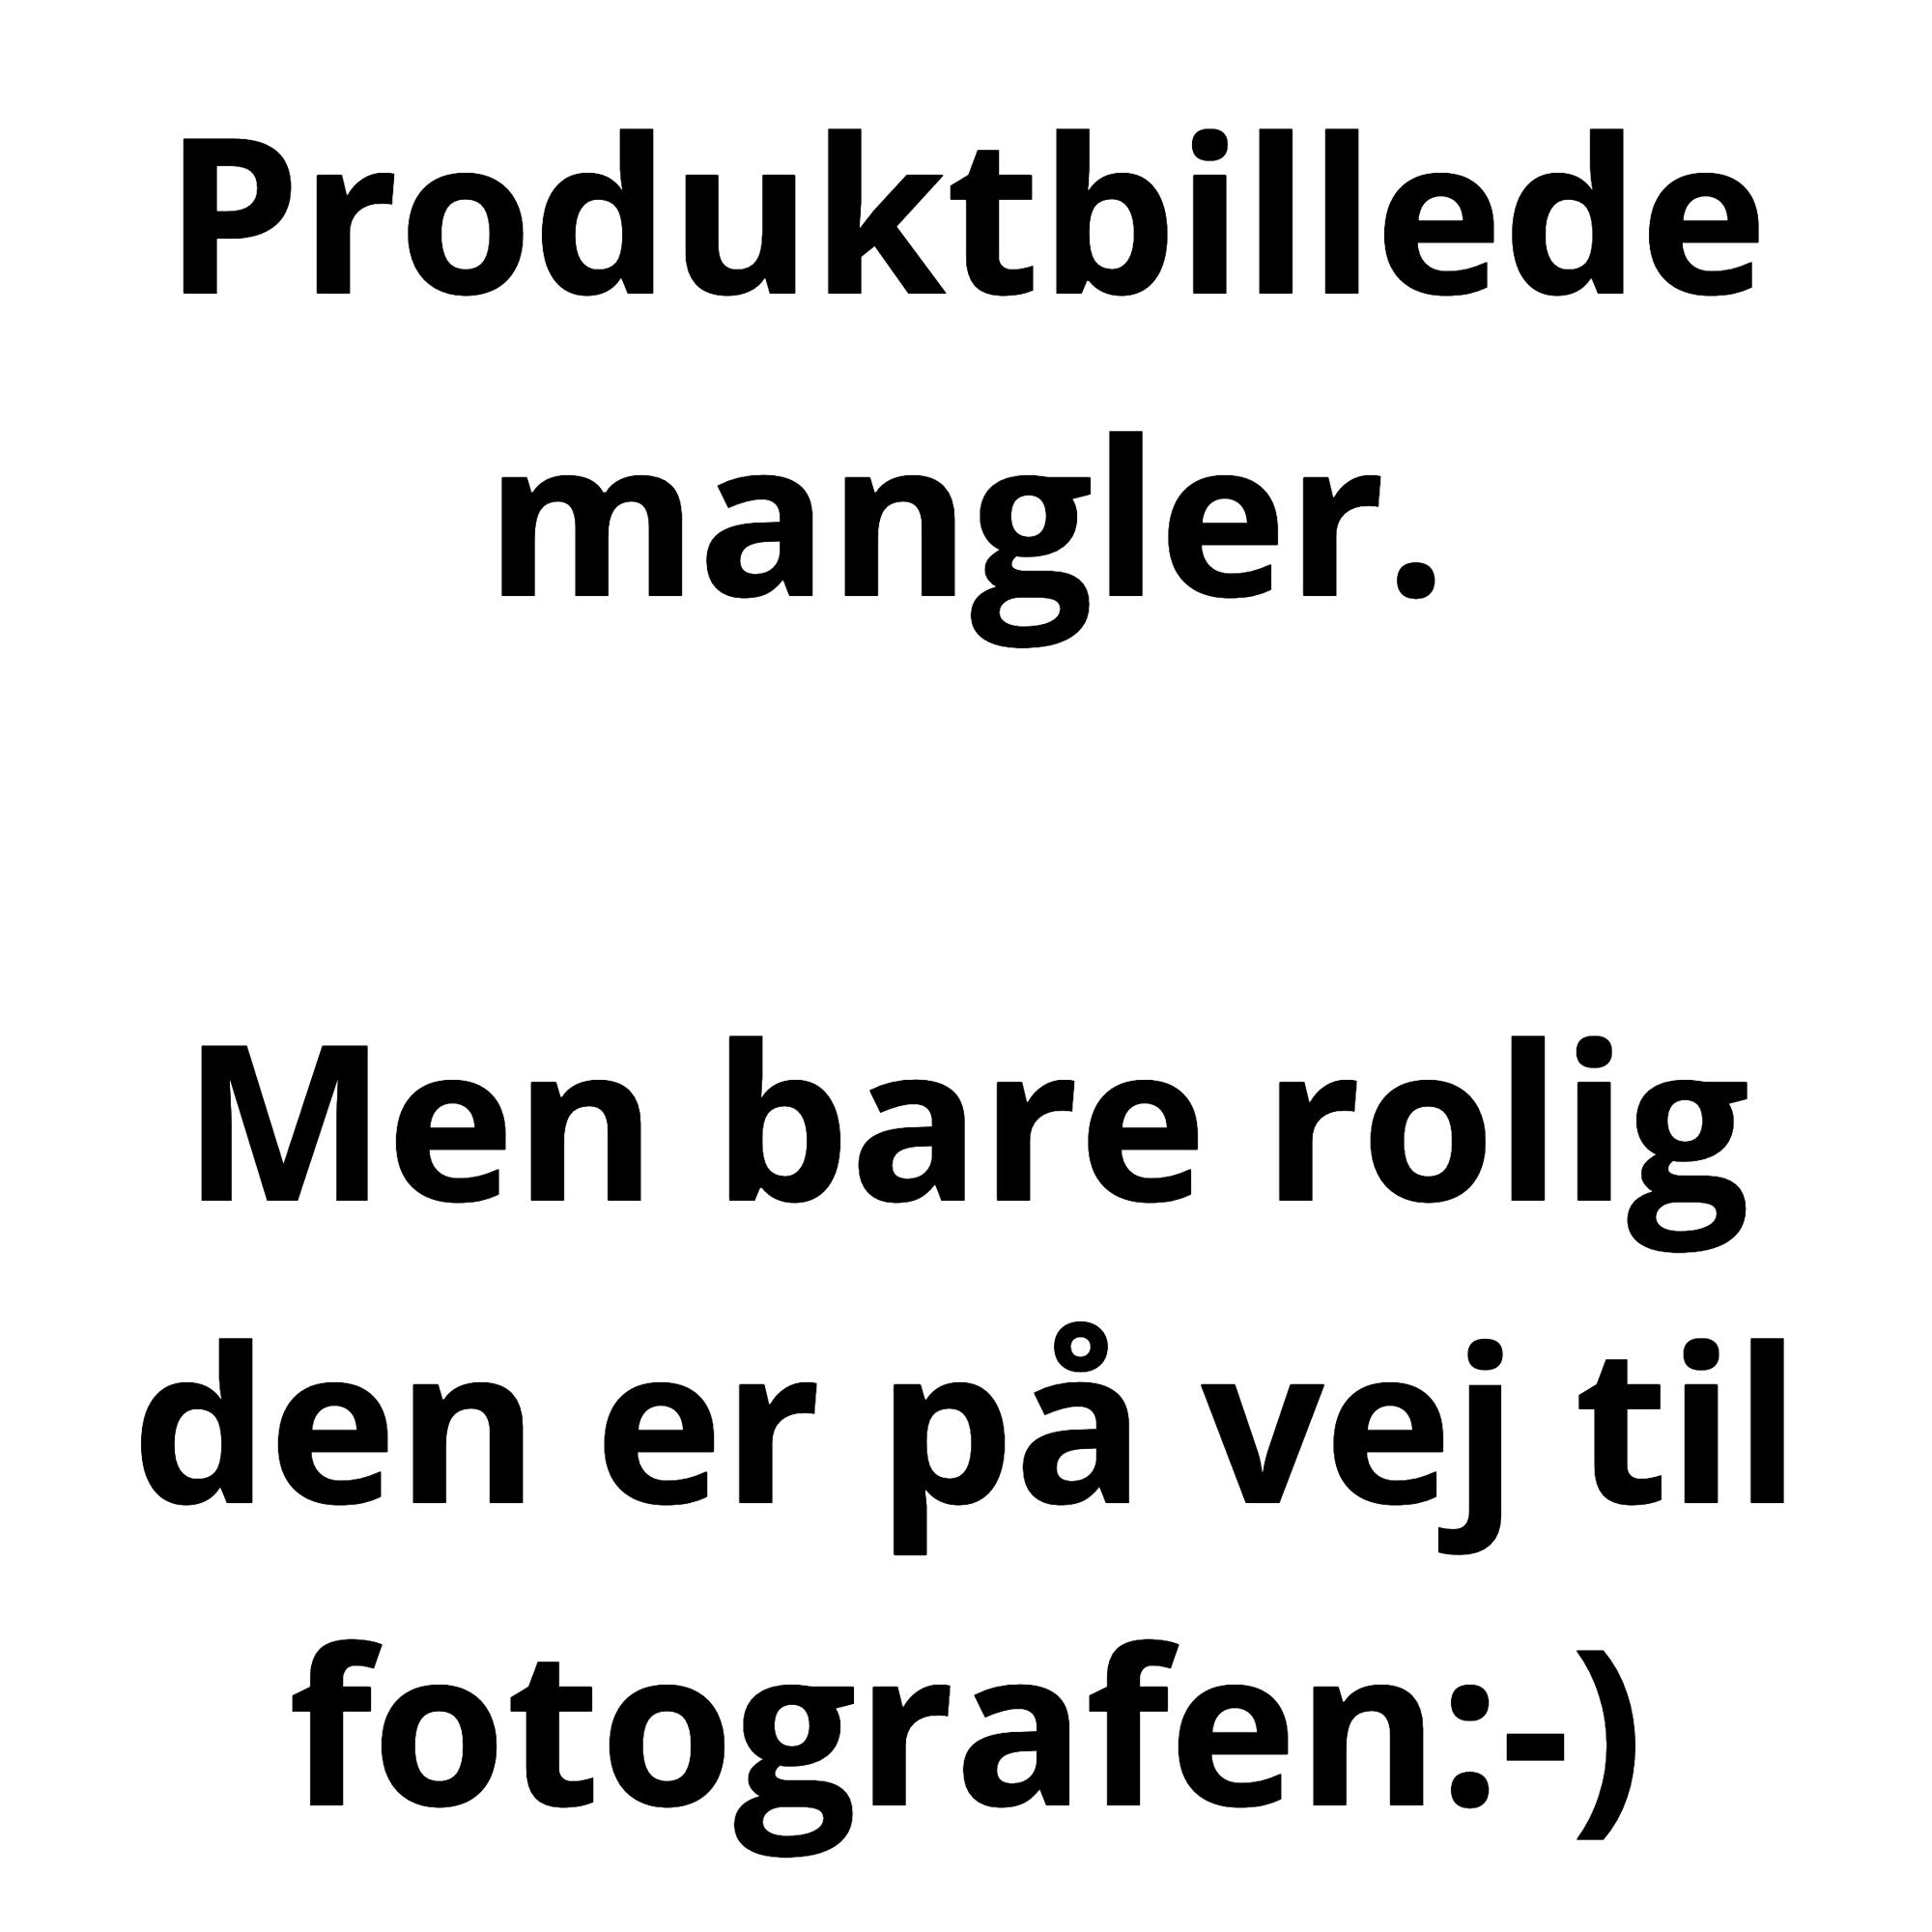 Parrot Mki9200 Bluetooth carkit - Dansk sprog